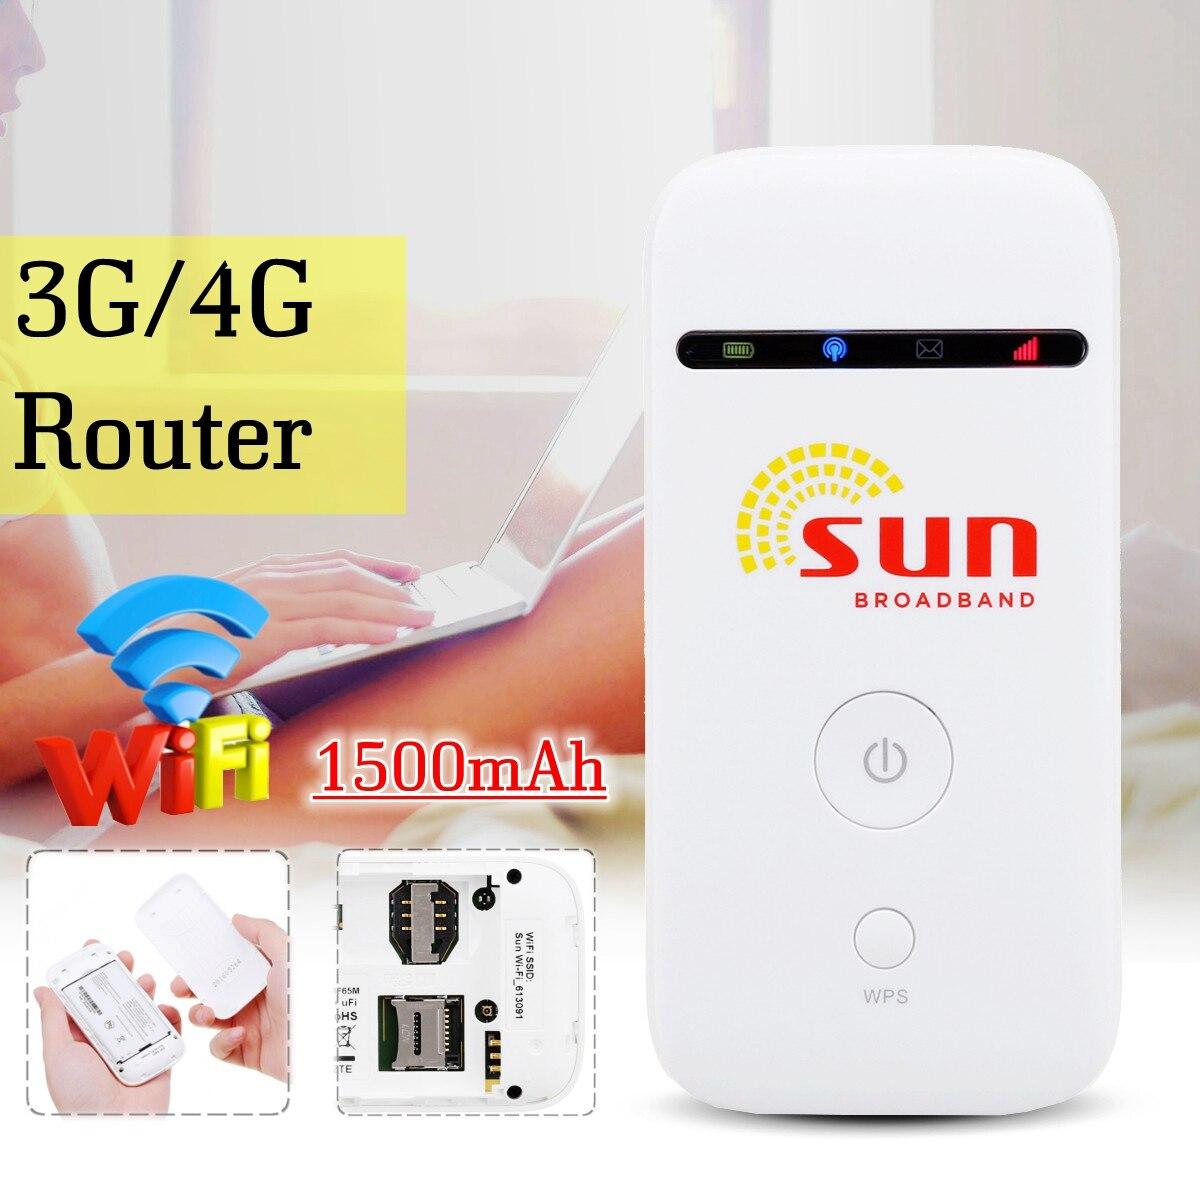 Unlockeds MF65 150Mbps 3G/4G Wireless Router 3G UMTS 21M Mobile Pockets WIFI Broadband 3G SIM Card Mifi Router цена в Москве и Питере